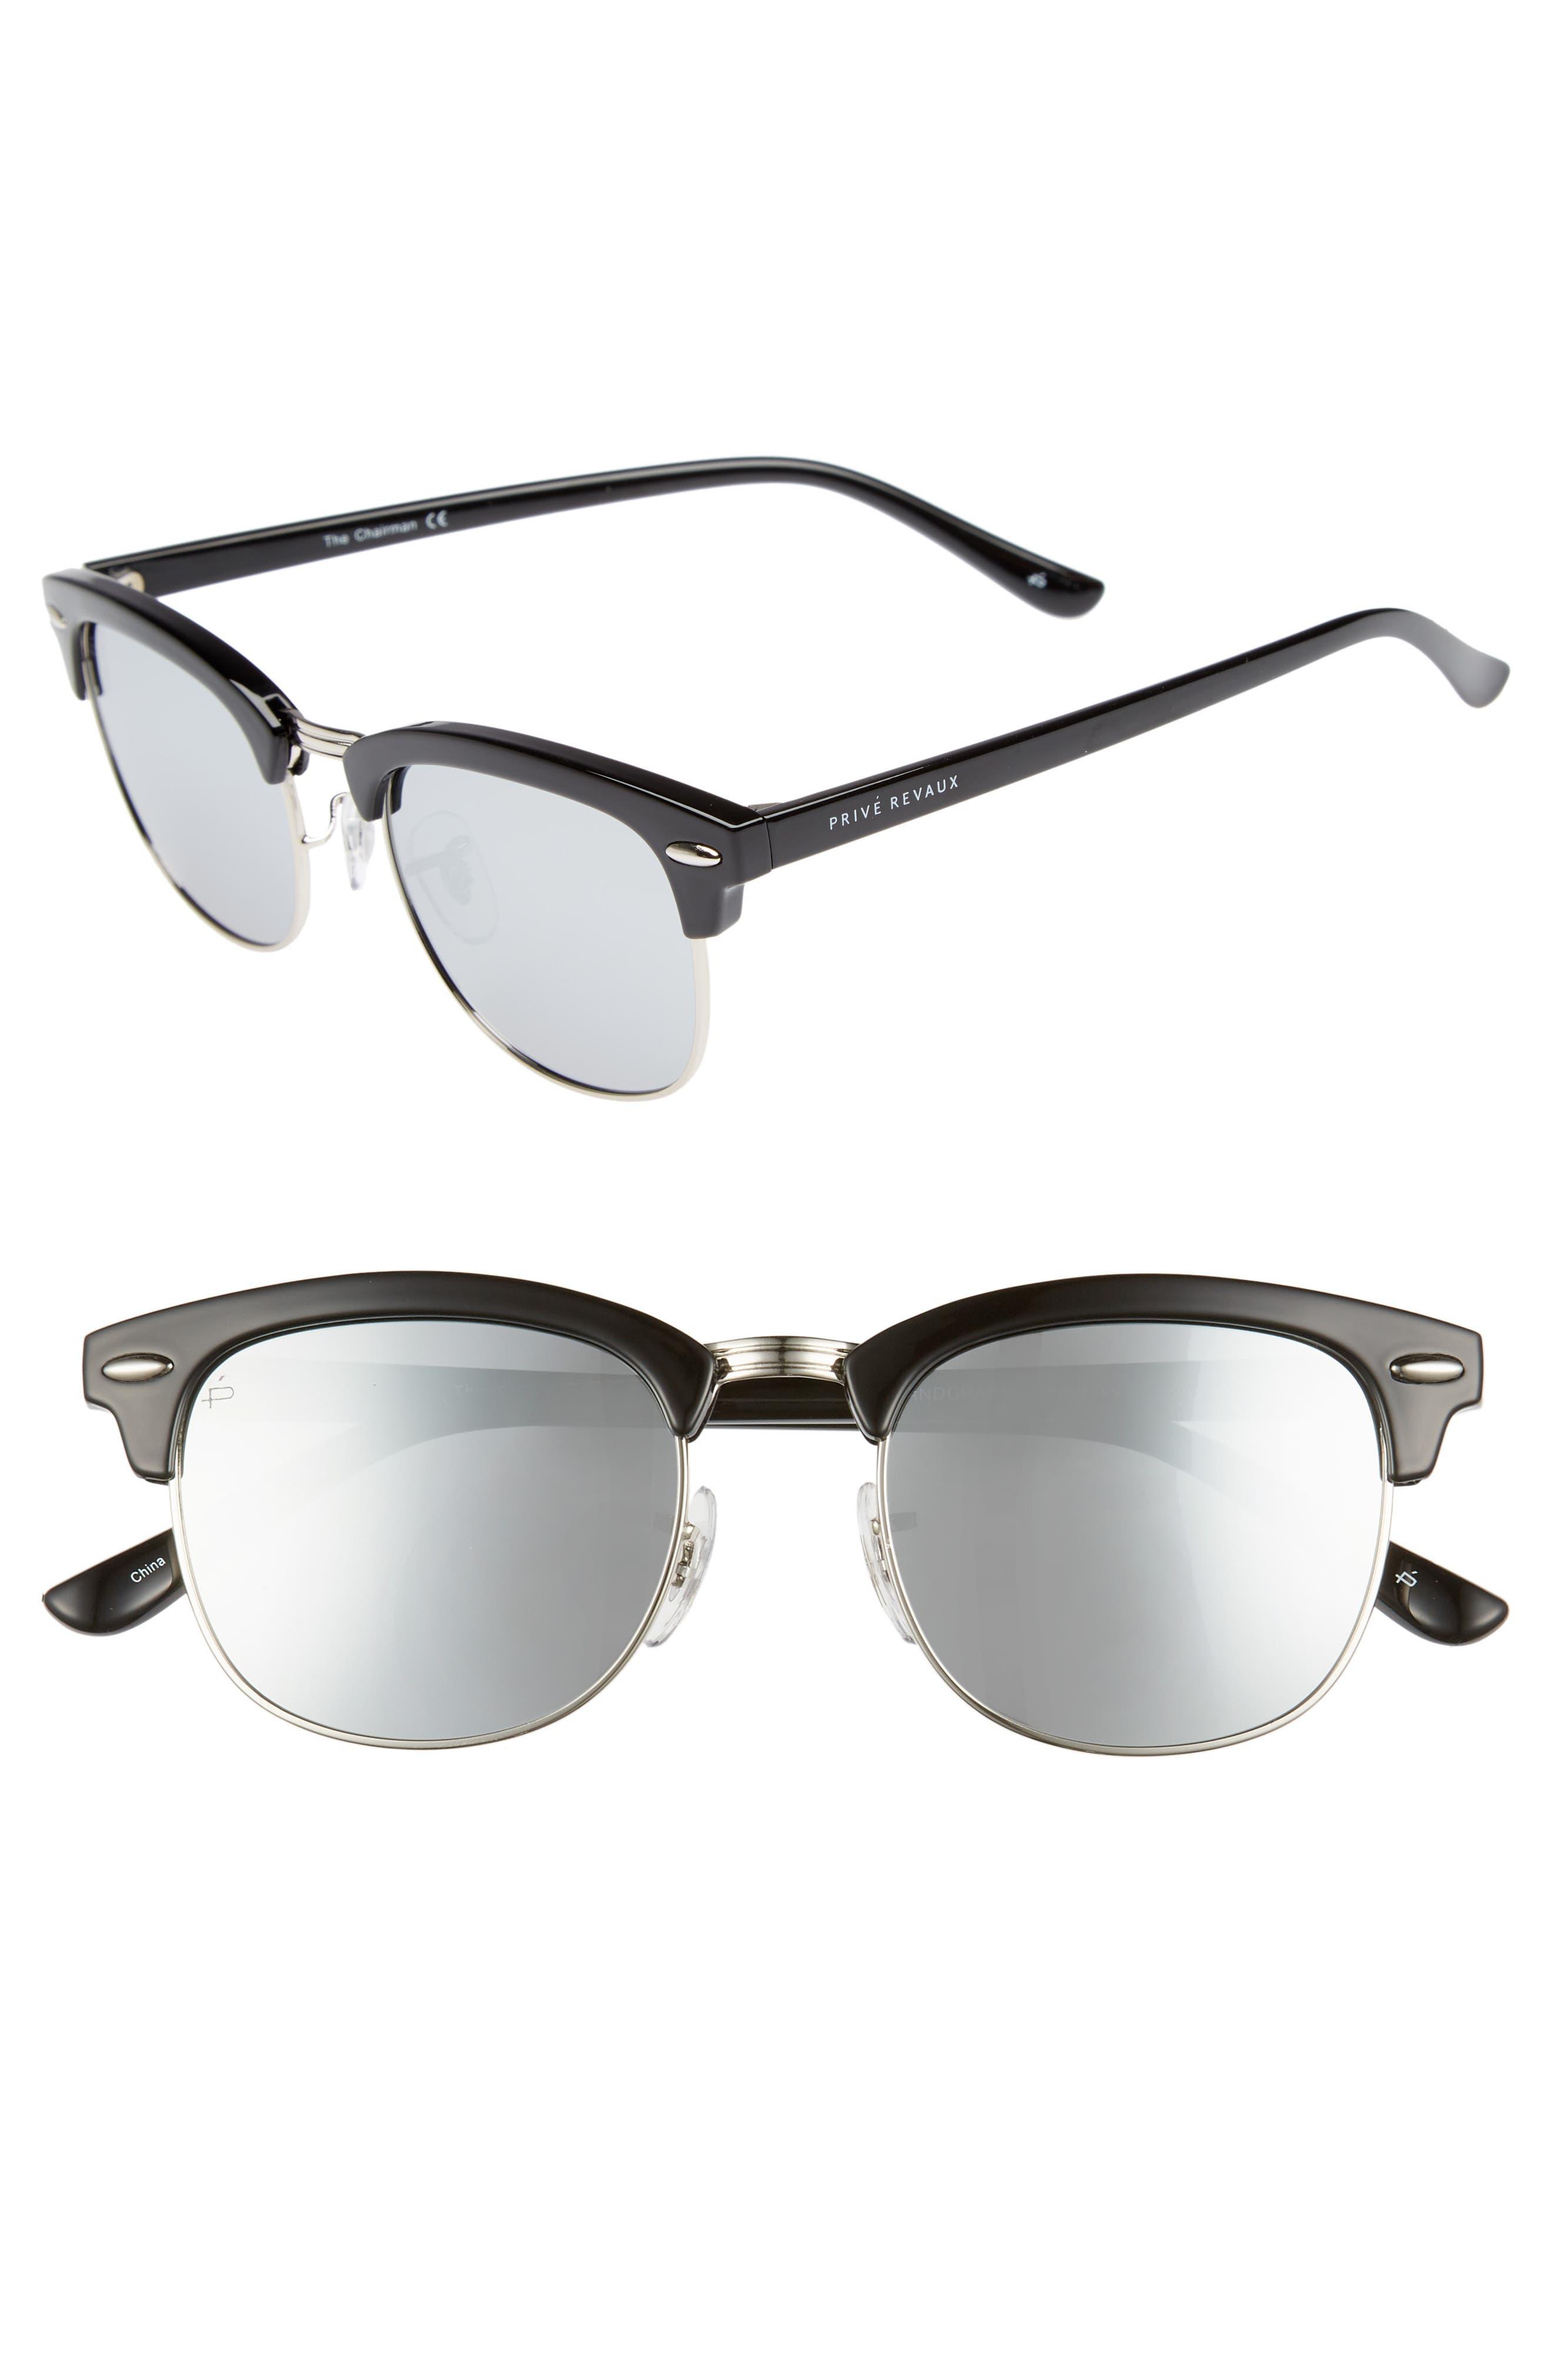 Privé Revaux The Chairman 52mm Polarized Browline Sunglasses,                         Main,                         color,